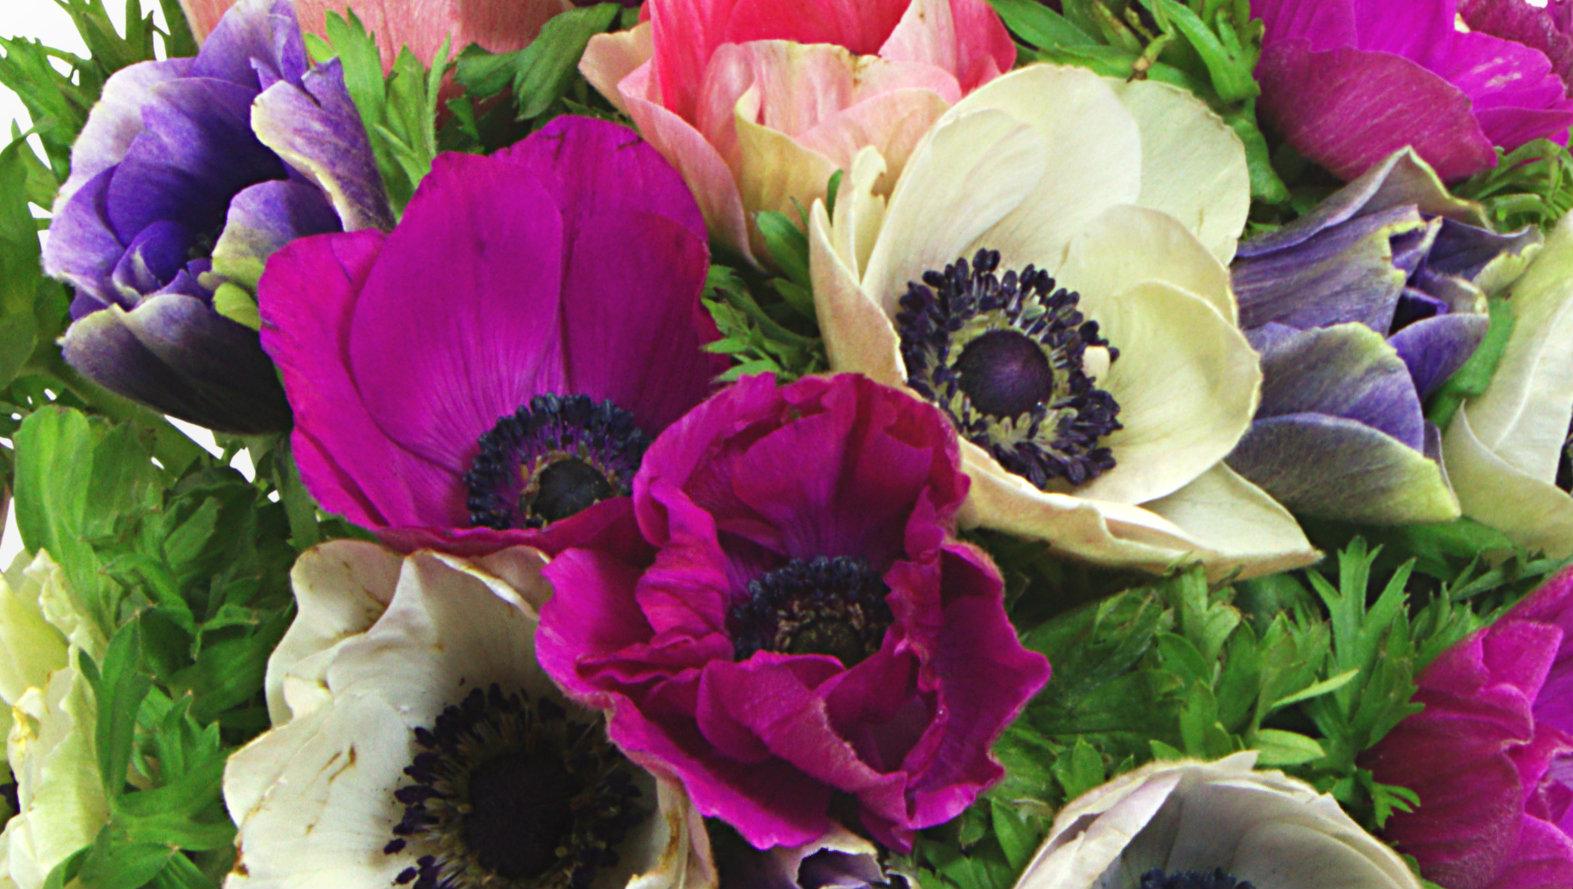 Biggest Flower Bouquet Images - Flower Wallpaper HD